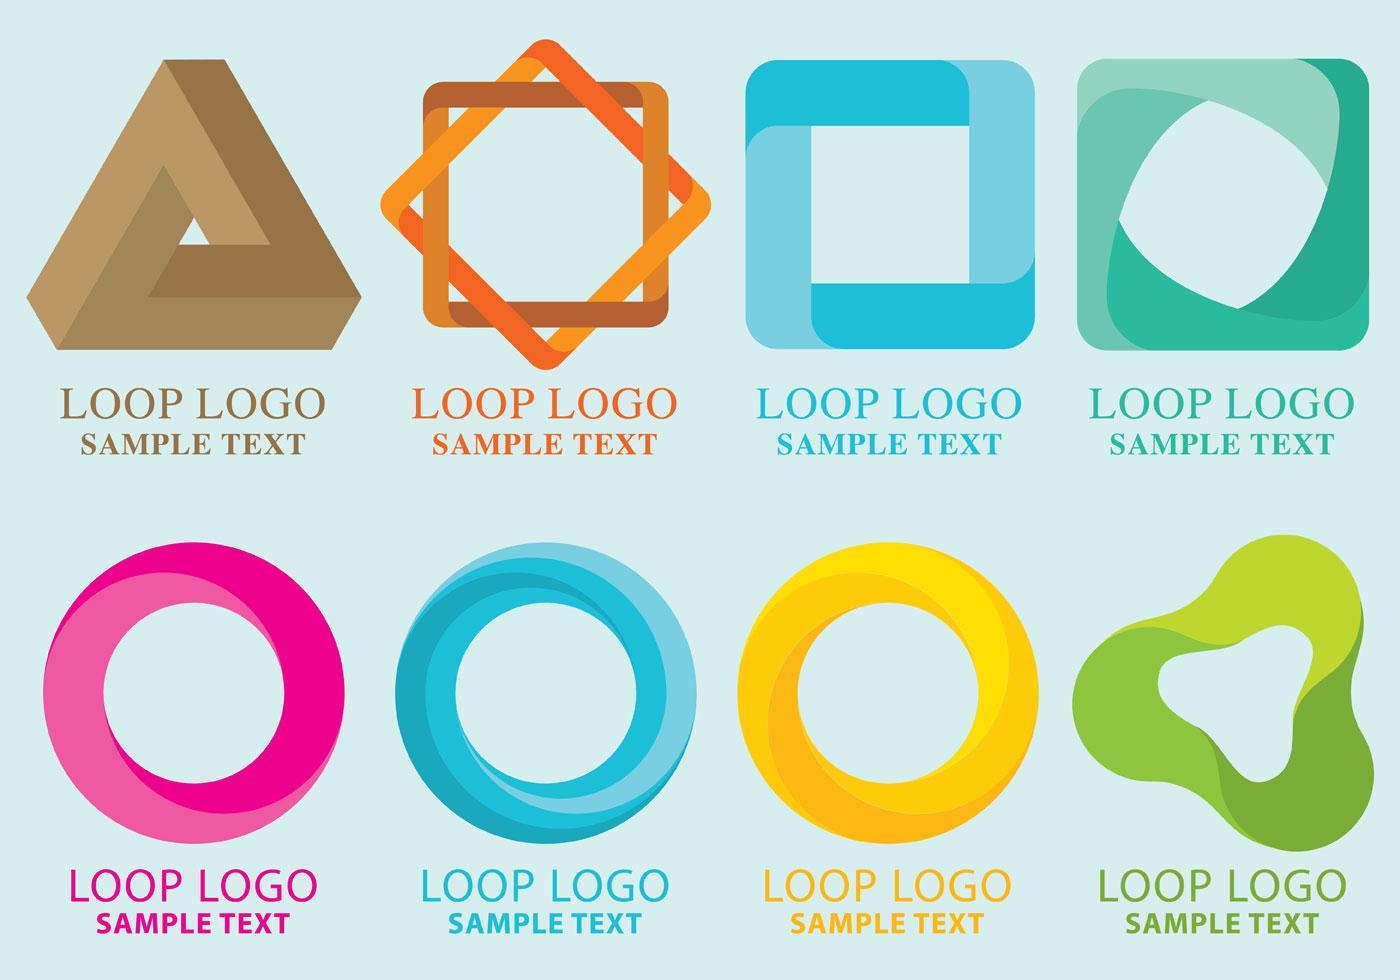 1400x980 Loop Logo Vectors Designrockr